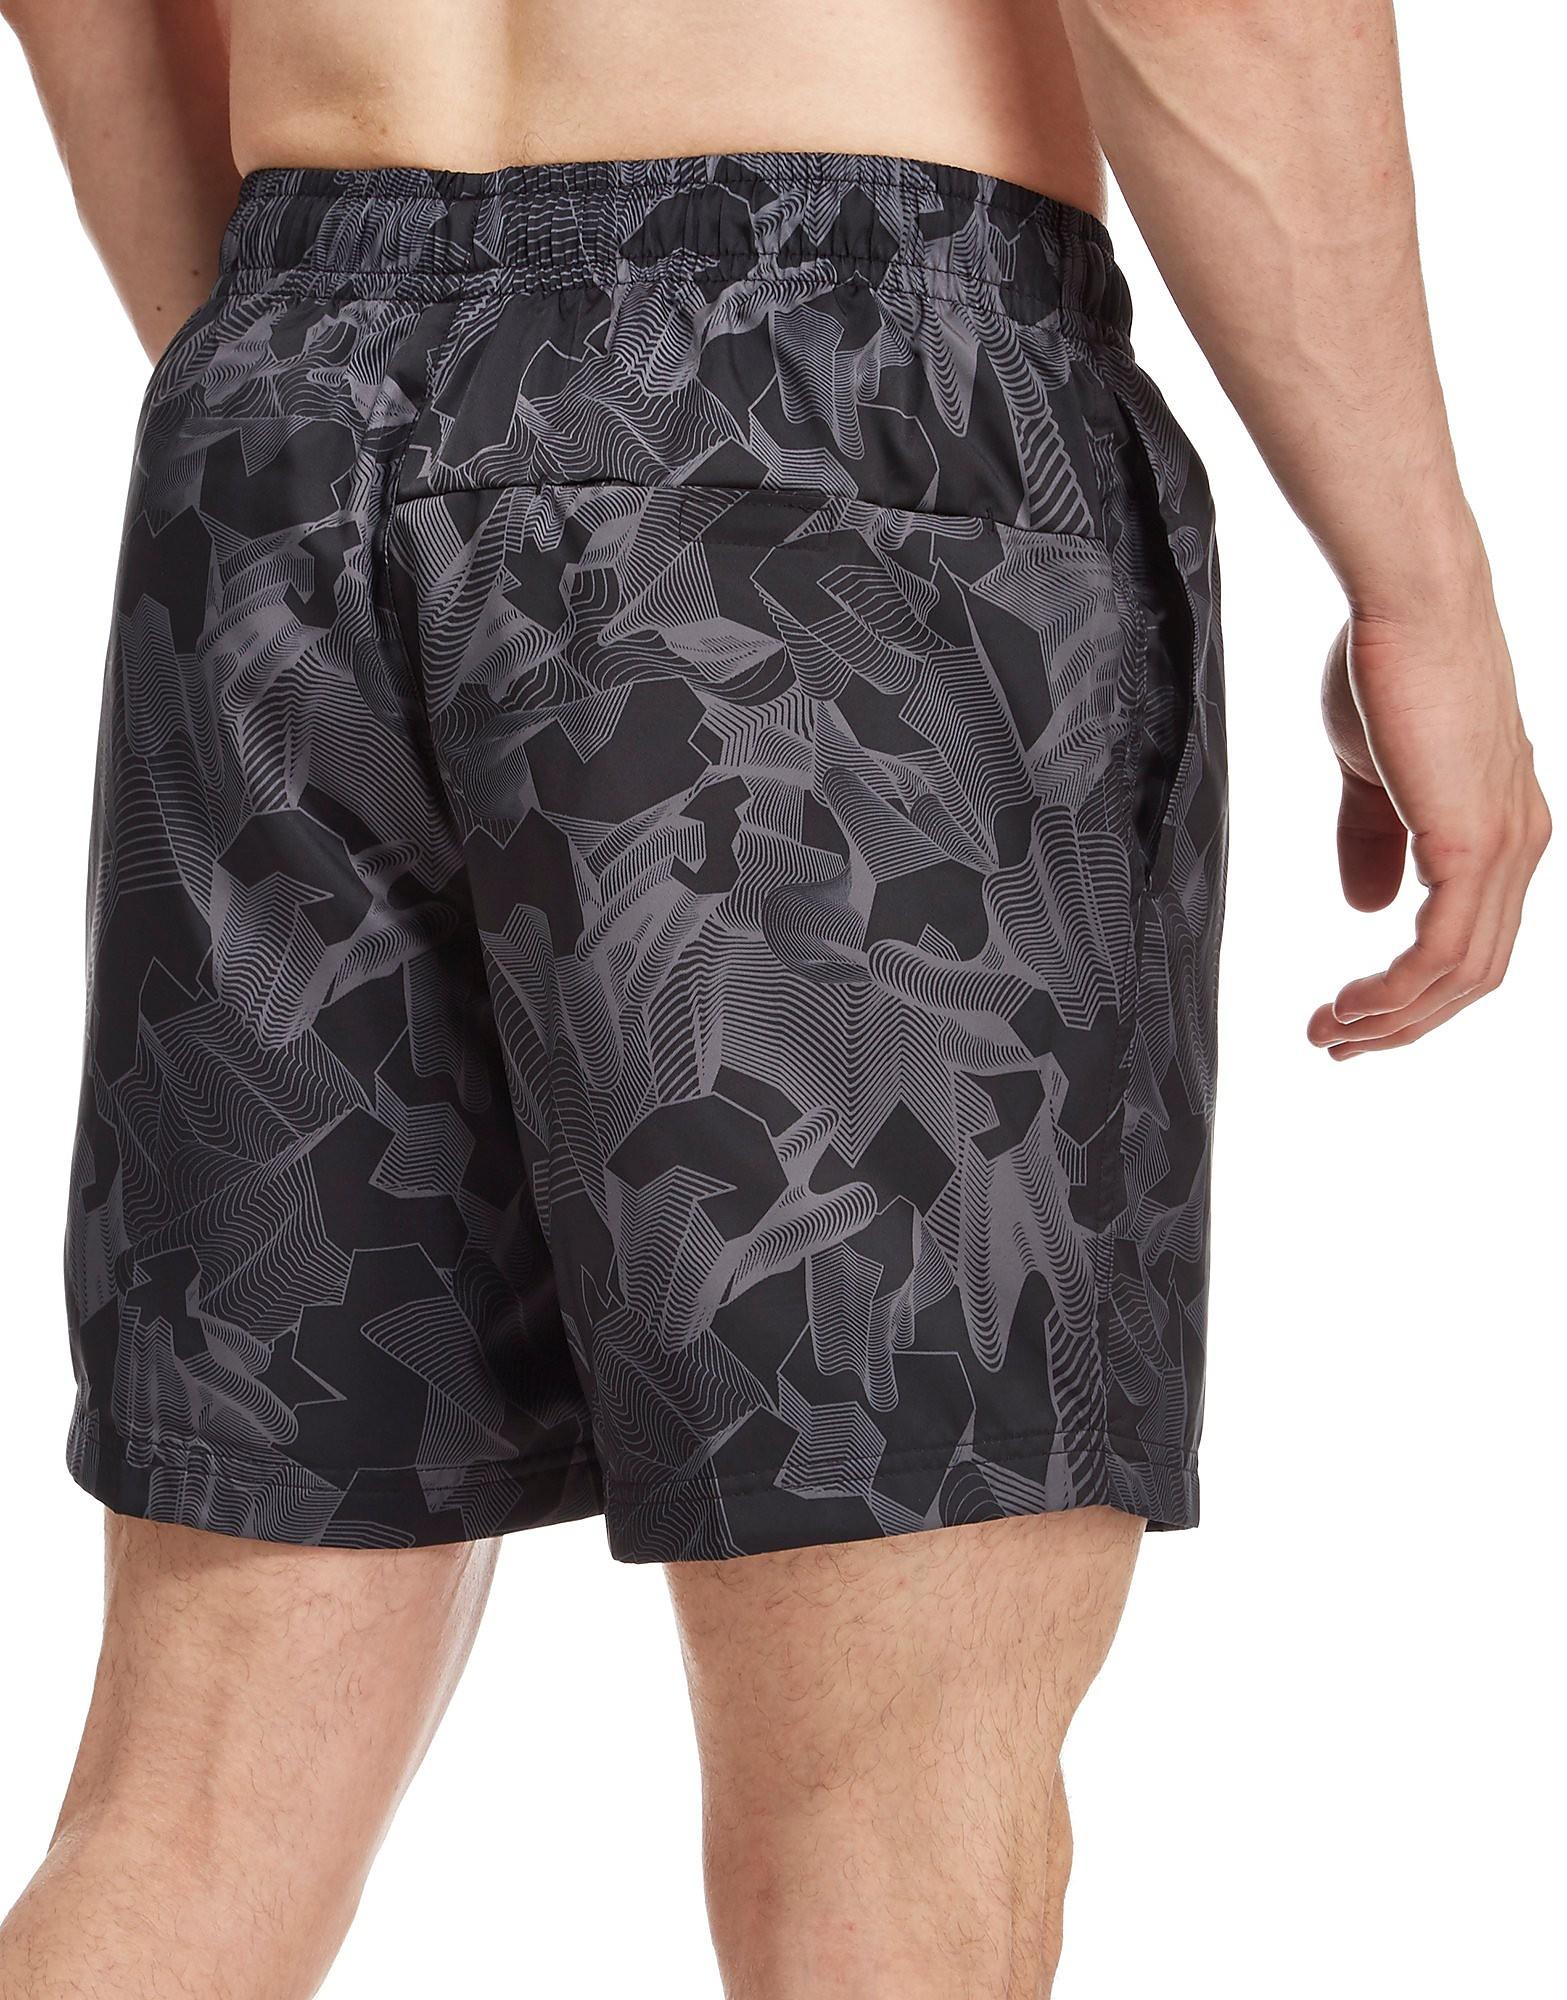 Nike All-Over Print Swim Shorts